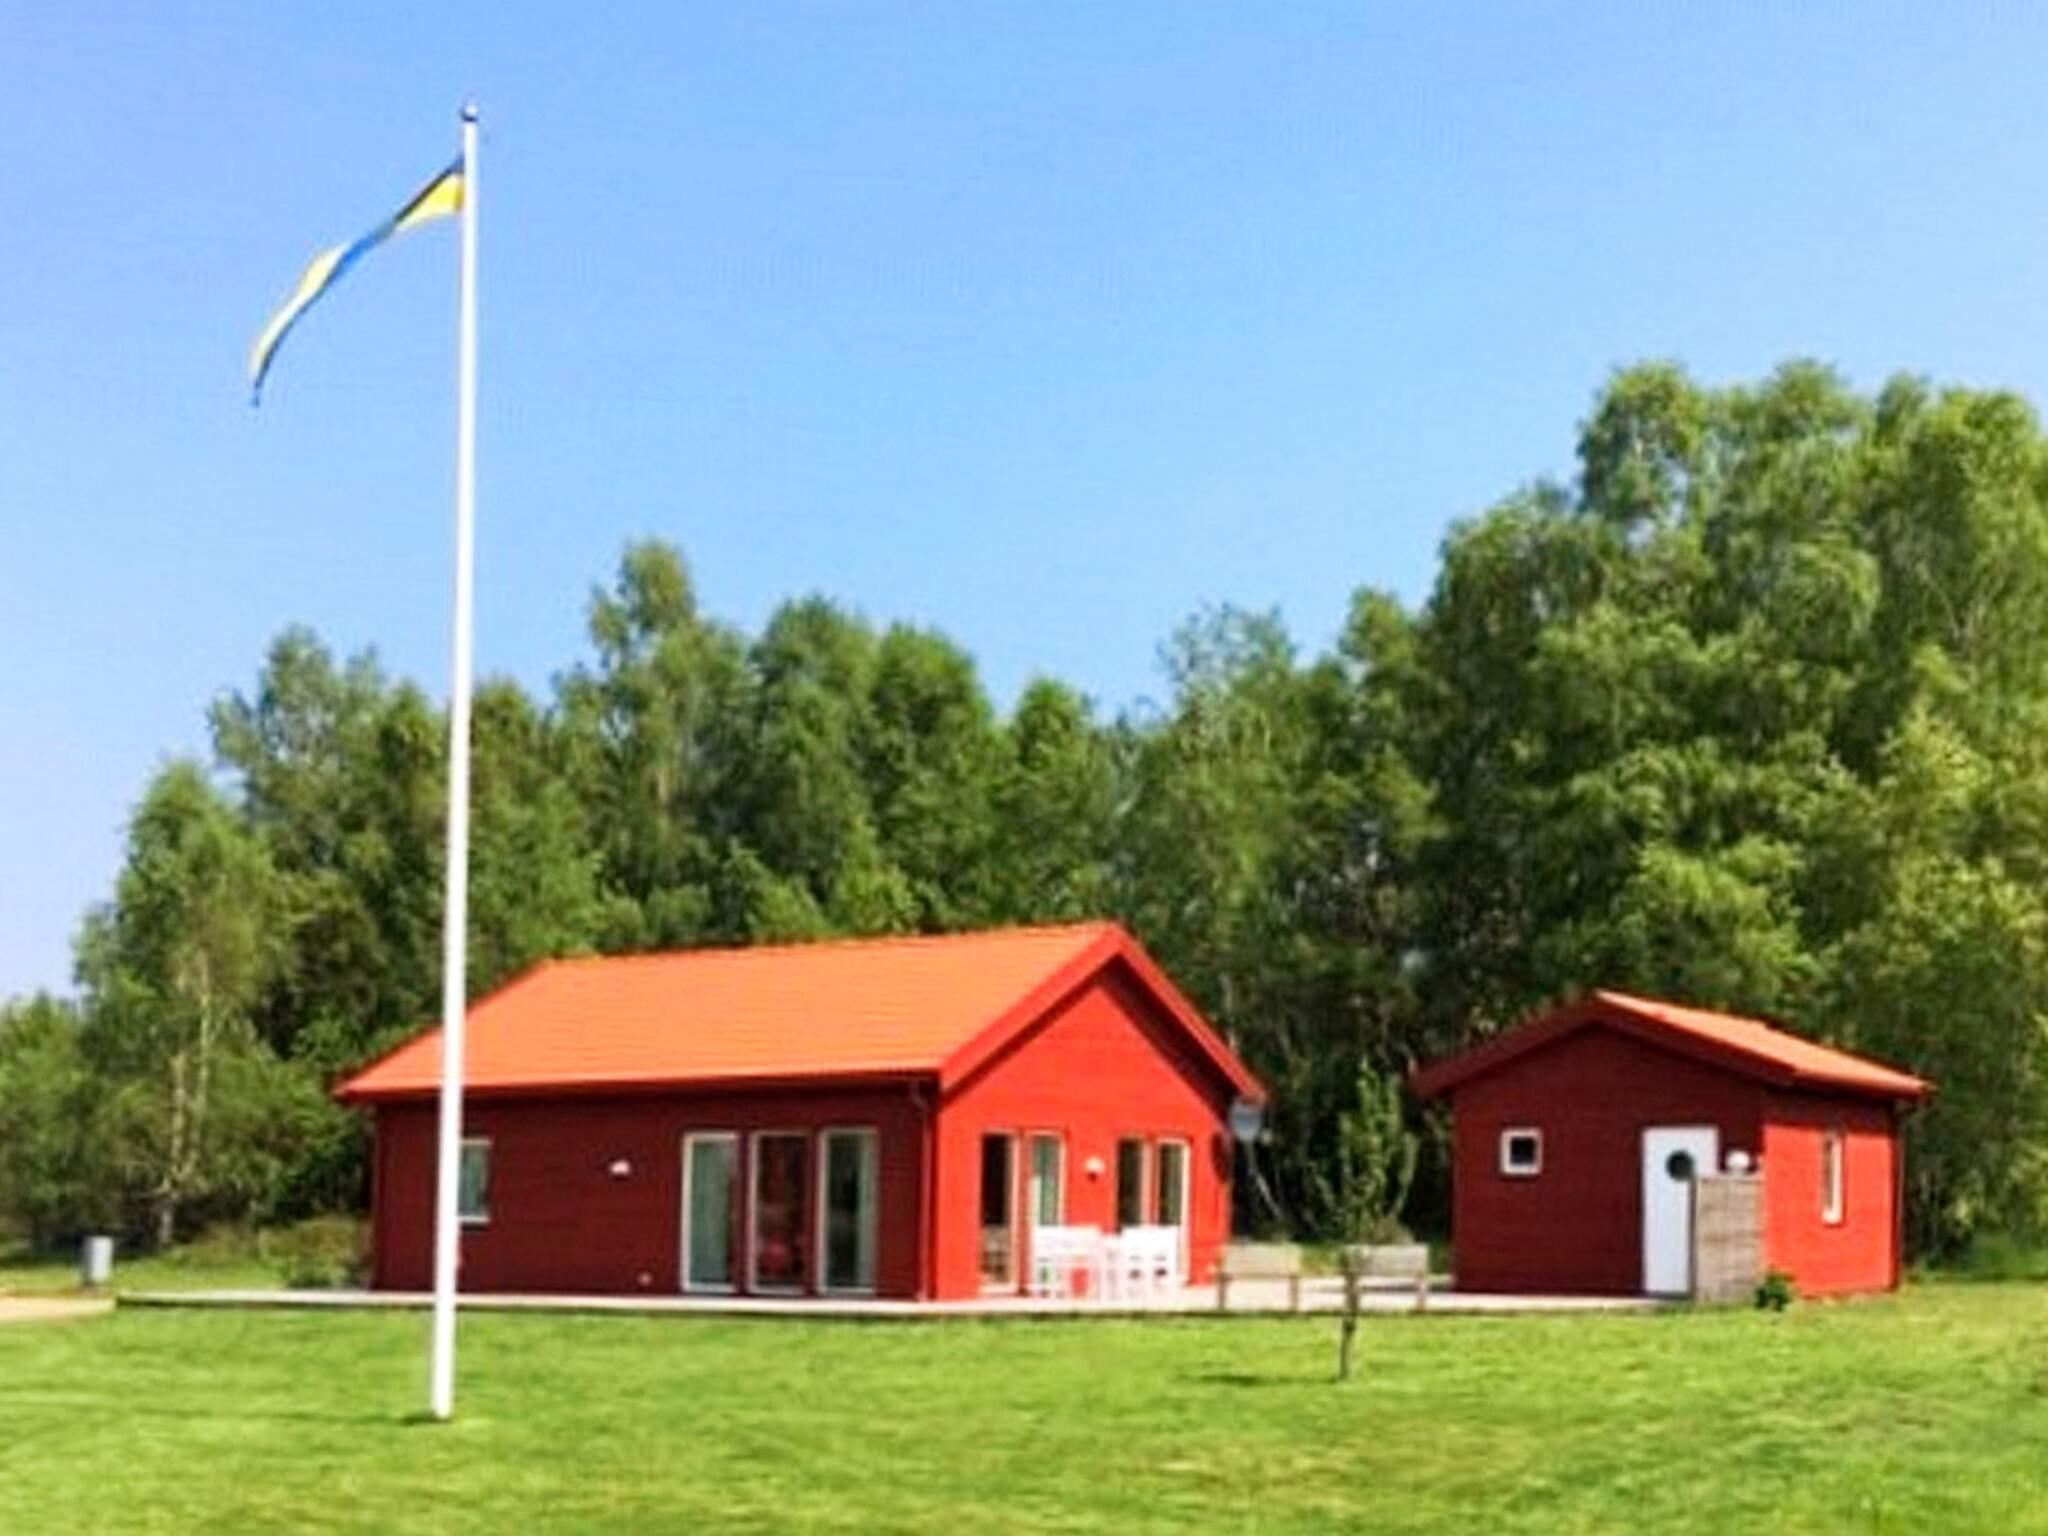 Ferienhaus Degeberga (2624324), Degeberga, Skane län, Südschweden, Schweden, Bild 1